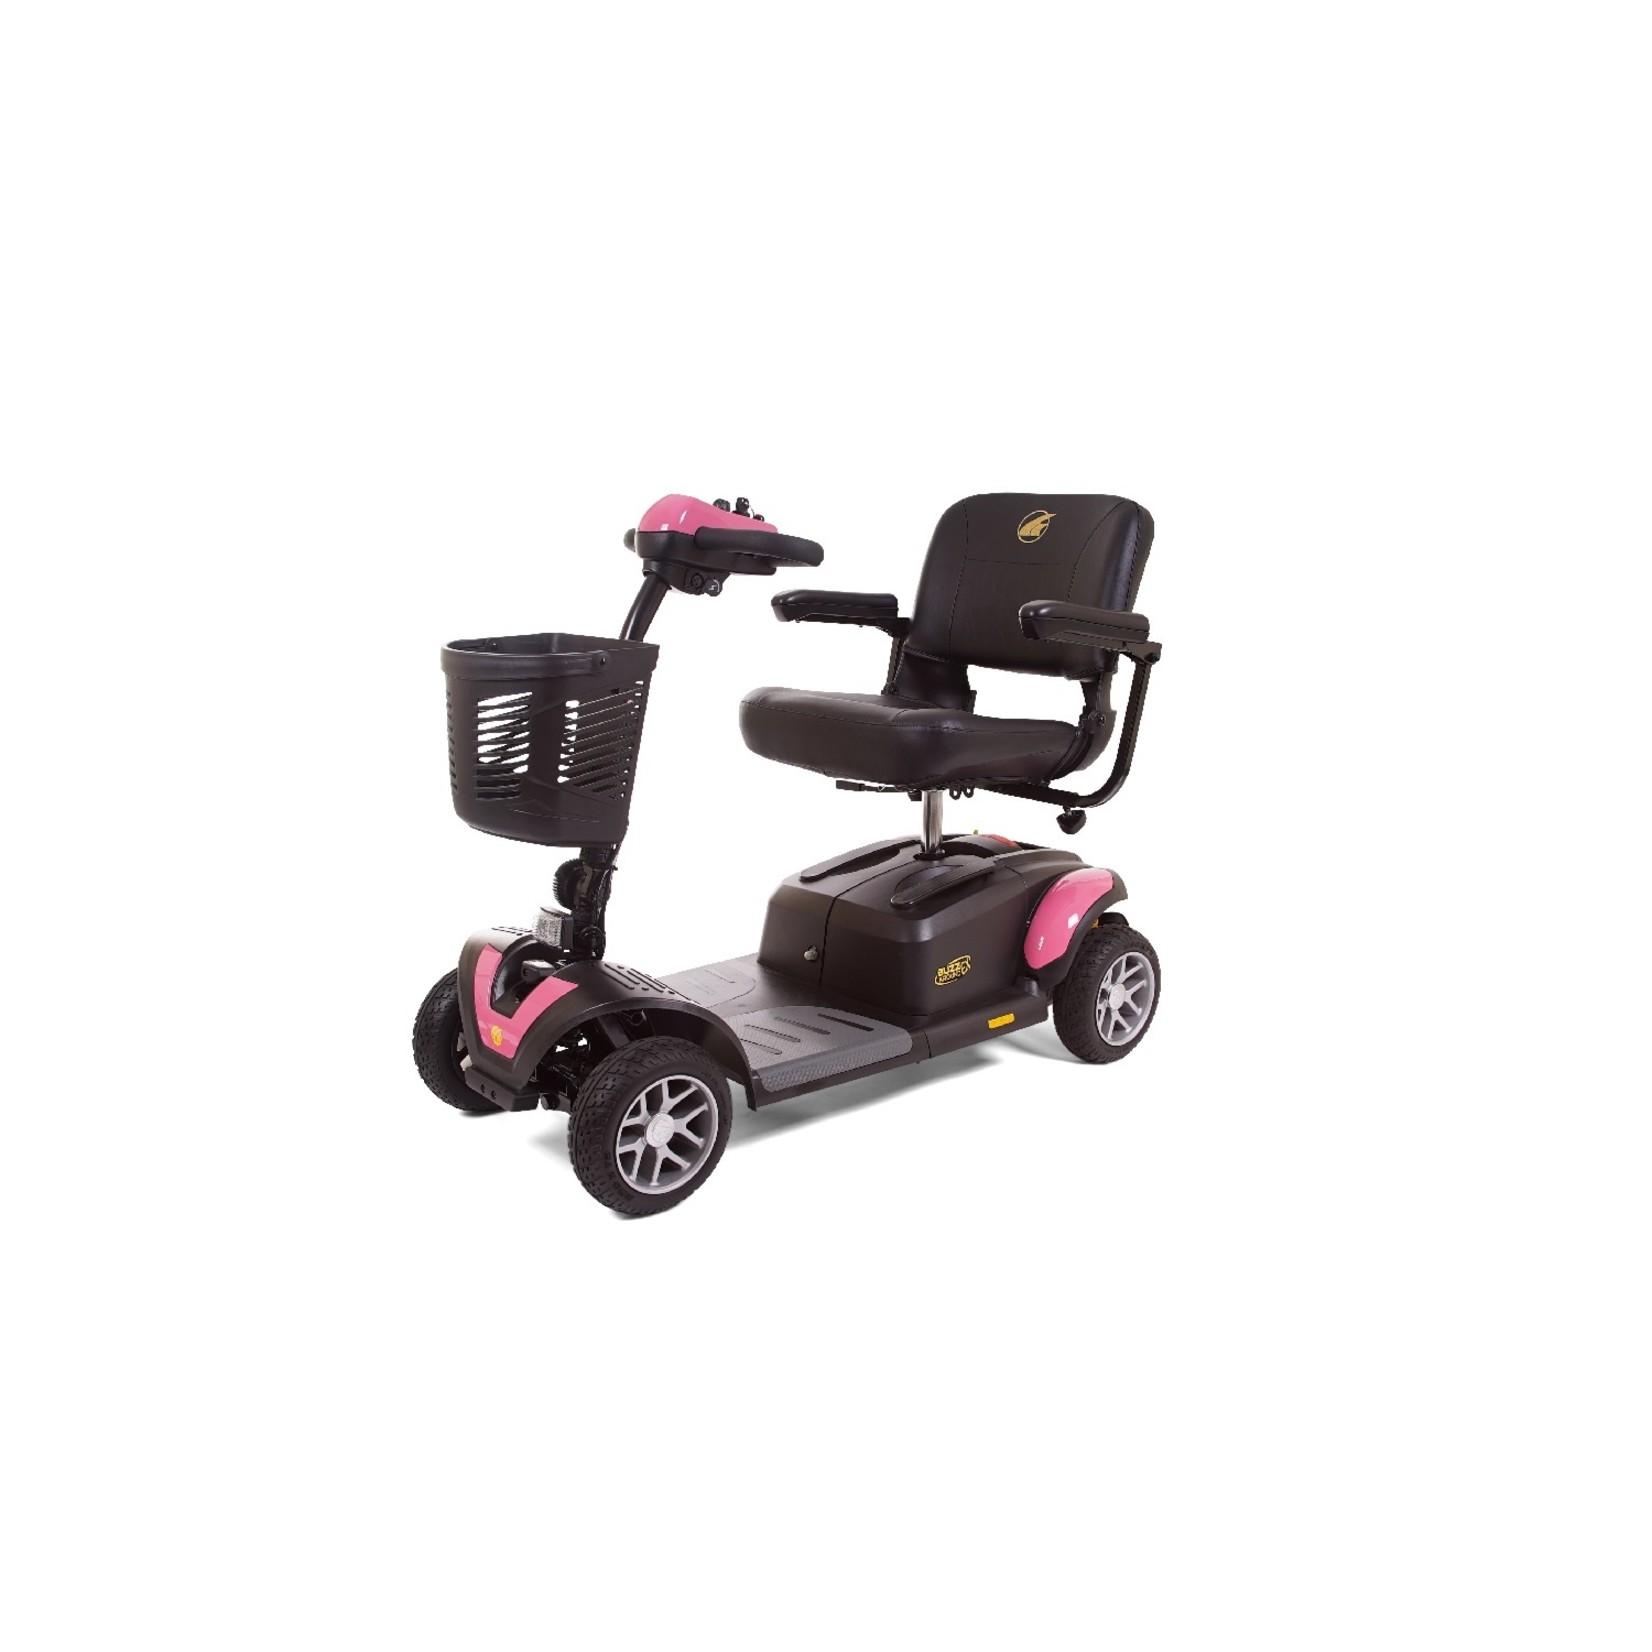 Golden Technologies Buzzaround EX 4-Wheel Scooters